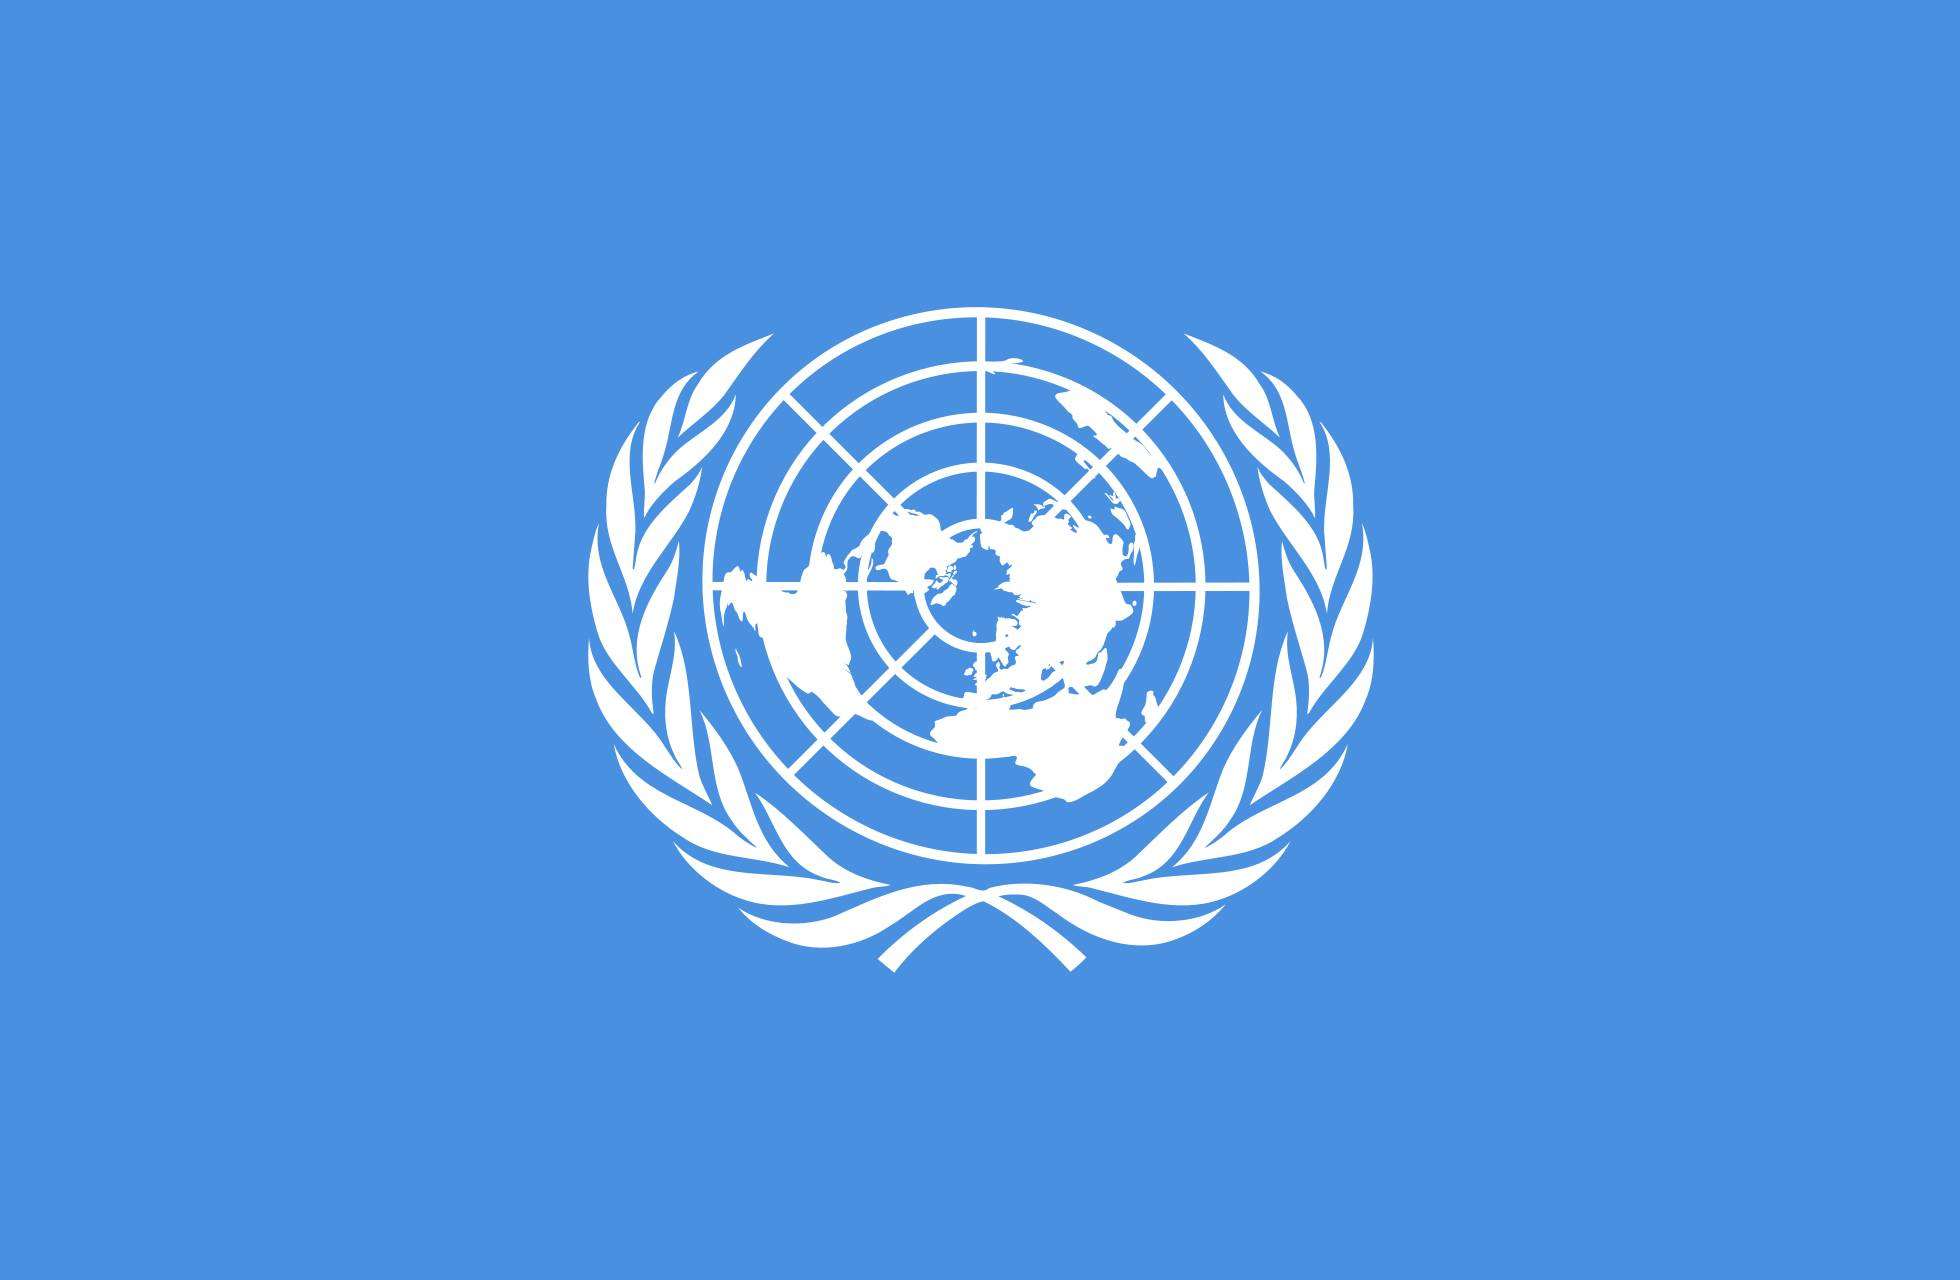 ONU jeff bezos